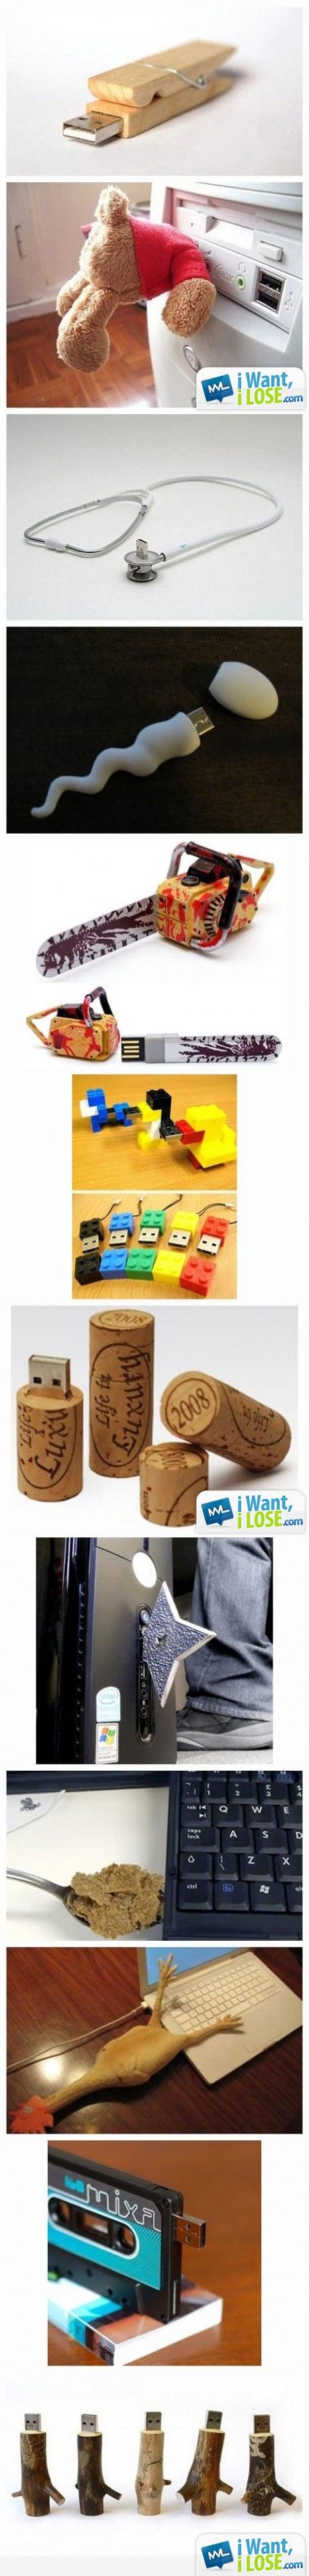 Unconventional USB drives. - Imgur